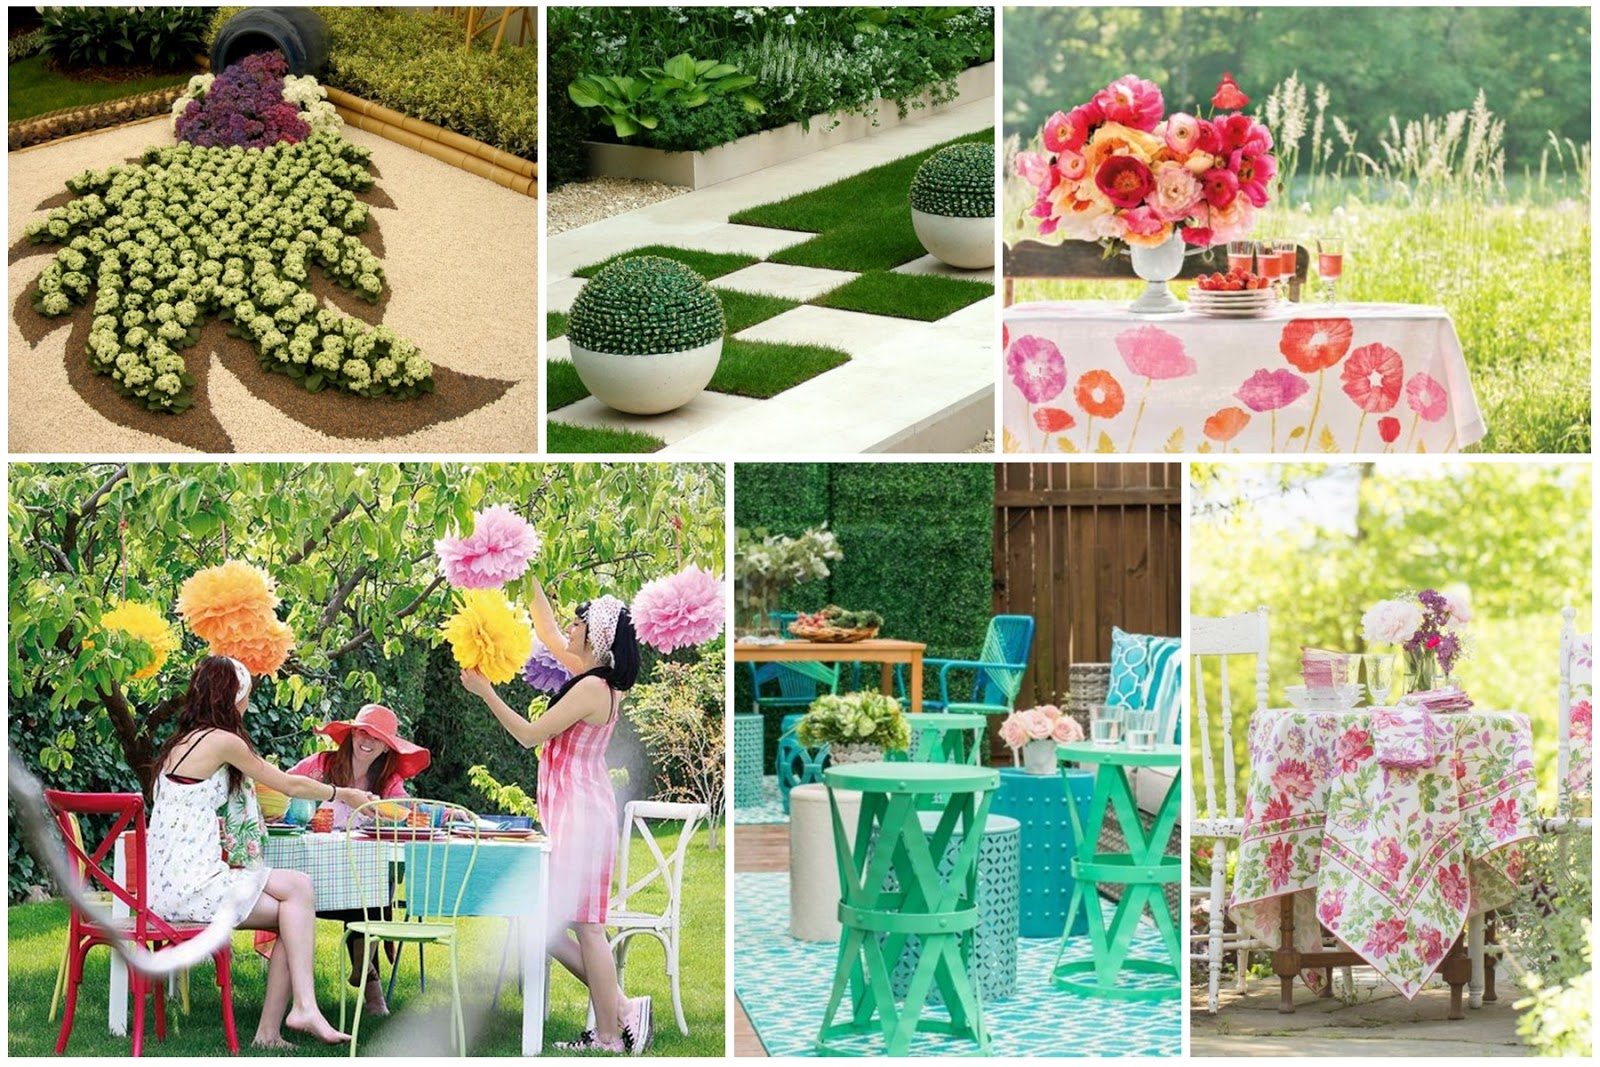 Home Garden Decorations Ideas For Summer 2018